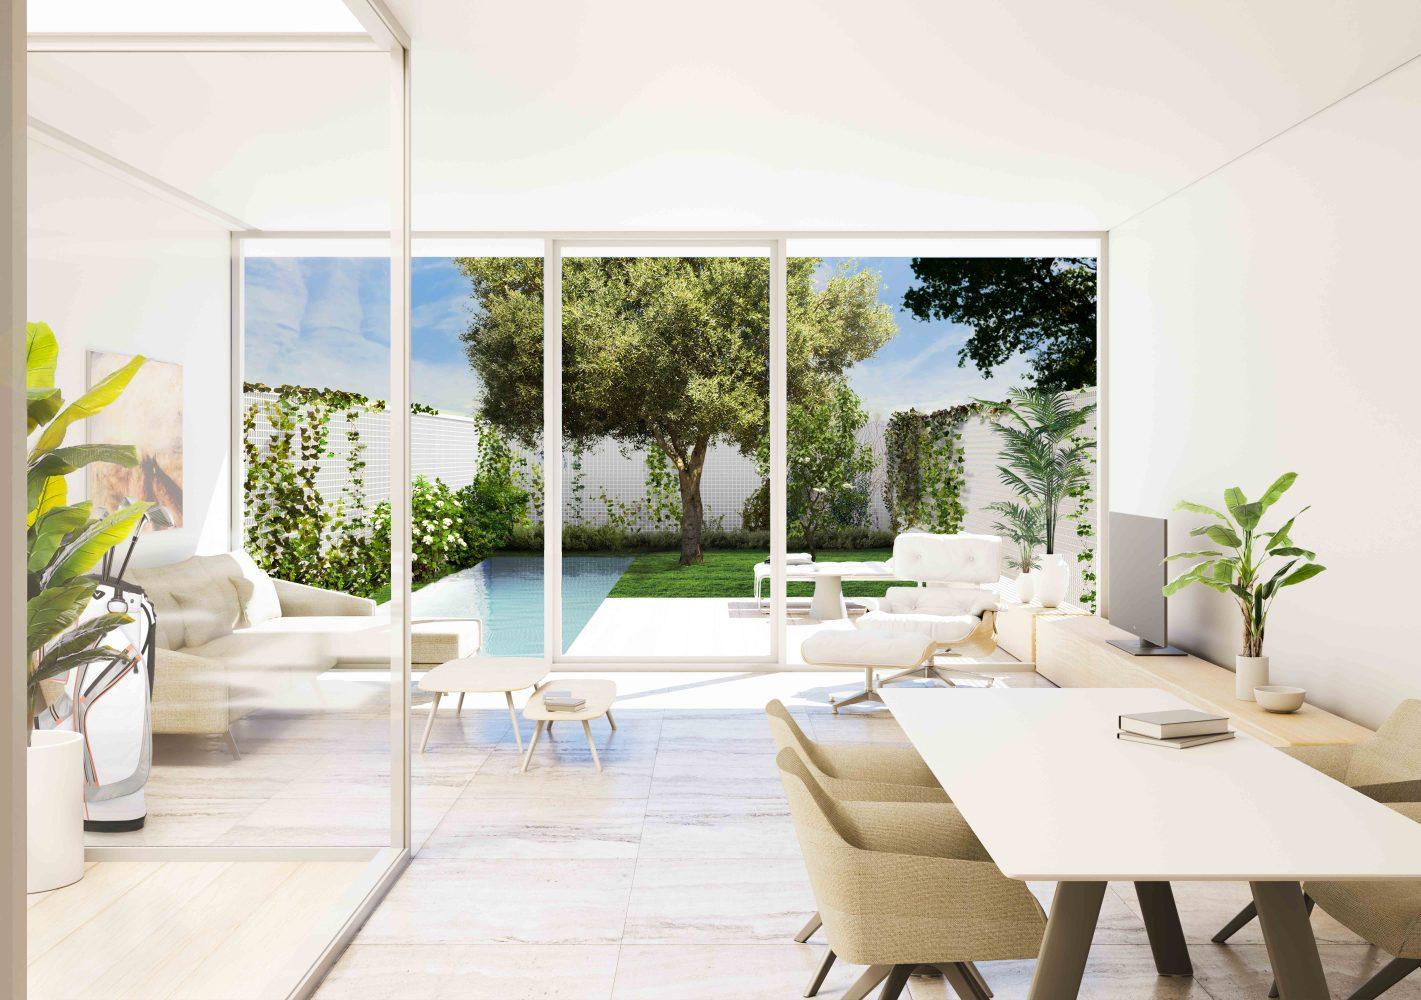 Lecoc arquitectura_arquitecto_valencia_residencialvalenciagolf_torre_conill_viviendas_diseño_05